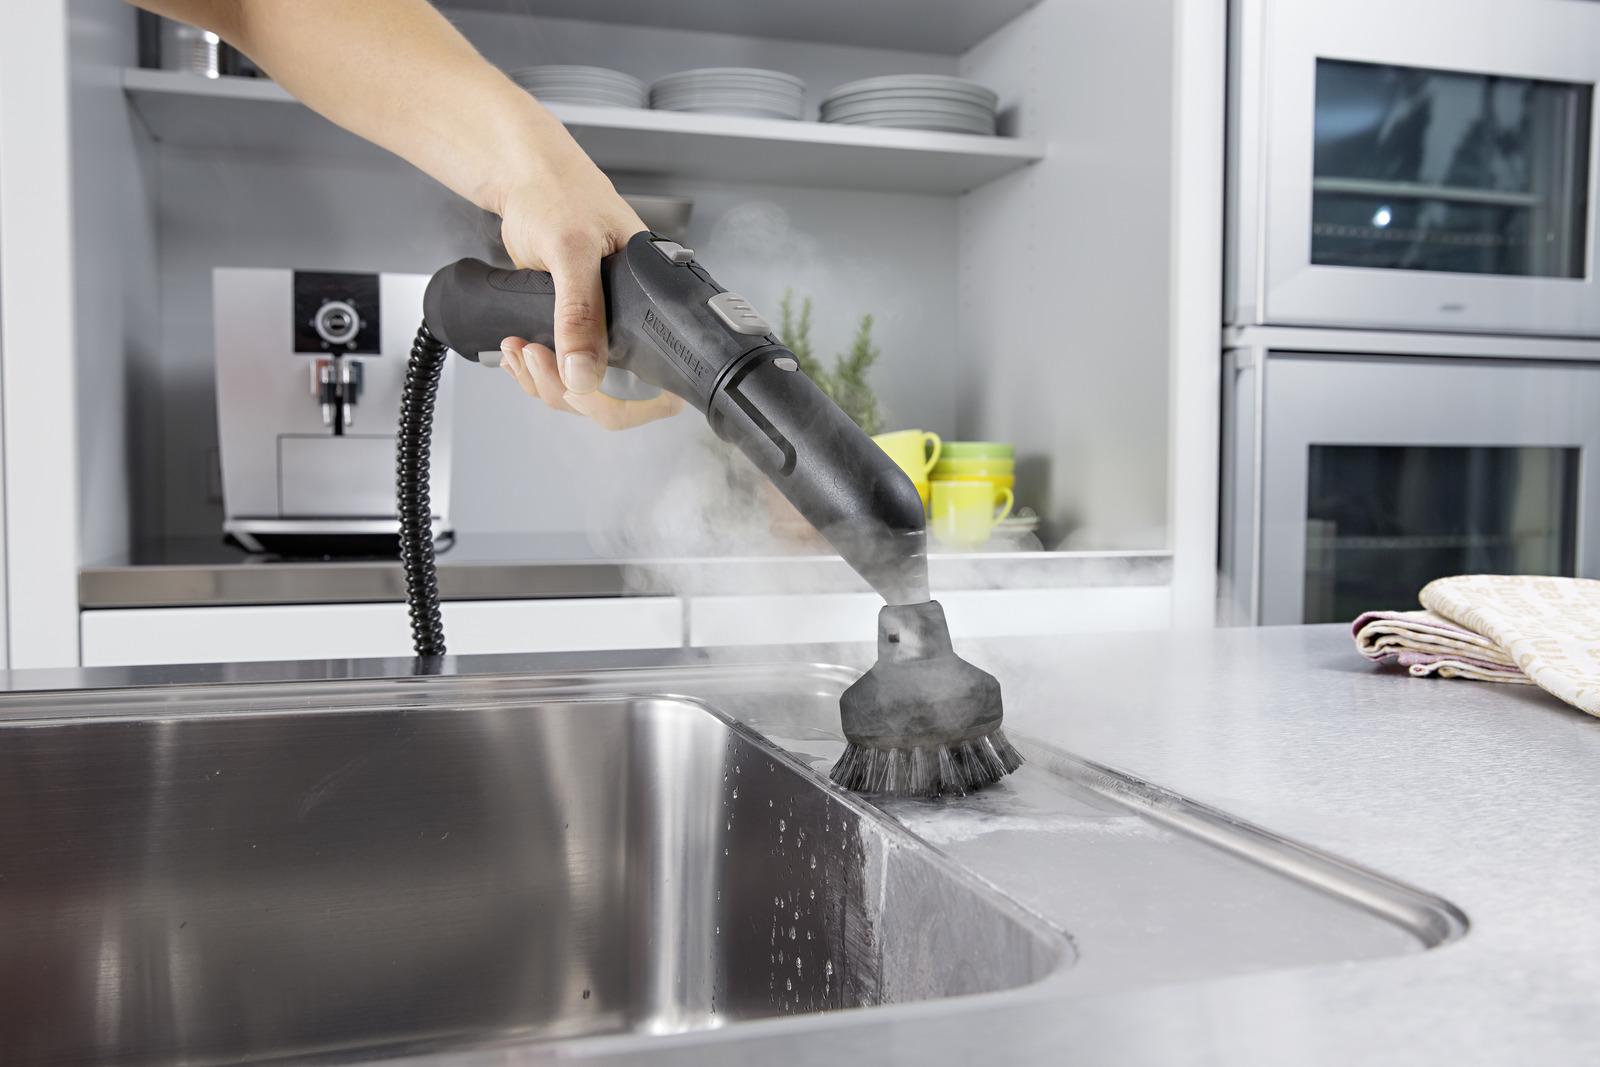 steam cleaner sc 5 easyfix premium k rcher uk. Black Bedroom Furniture Sets. Home Design Ideas